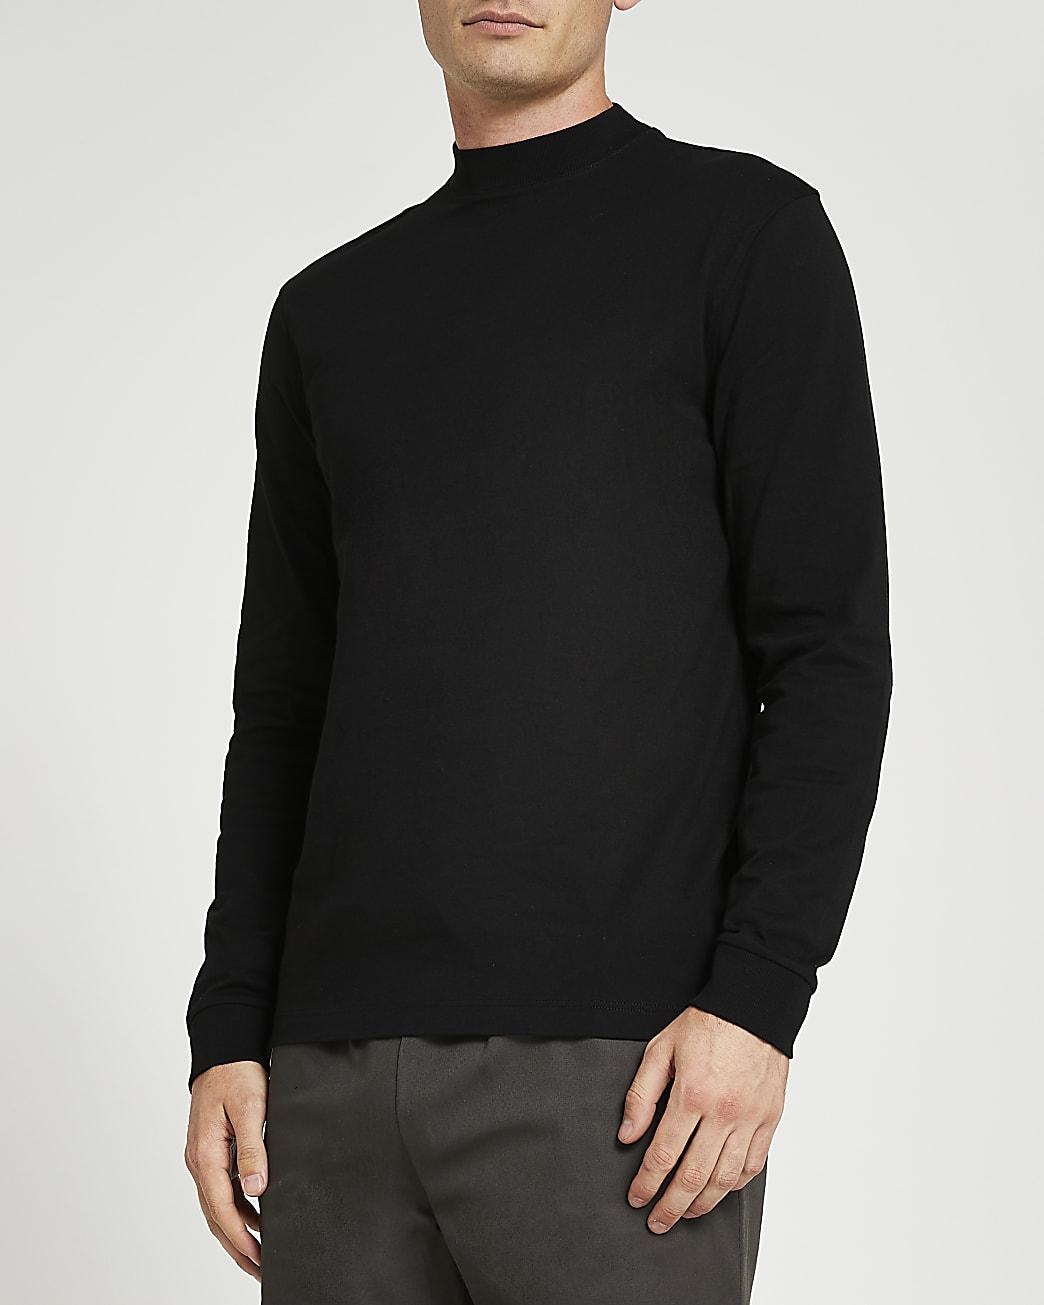 Black slim fit turtle neck t-shirt